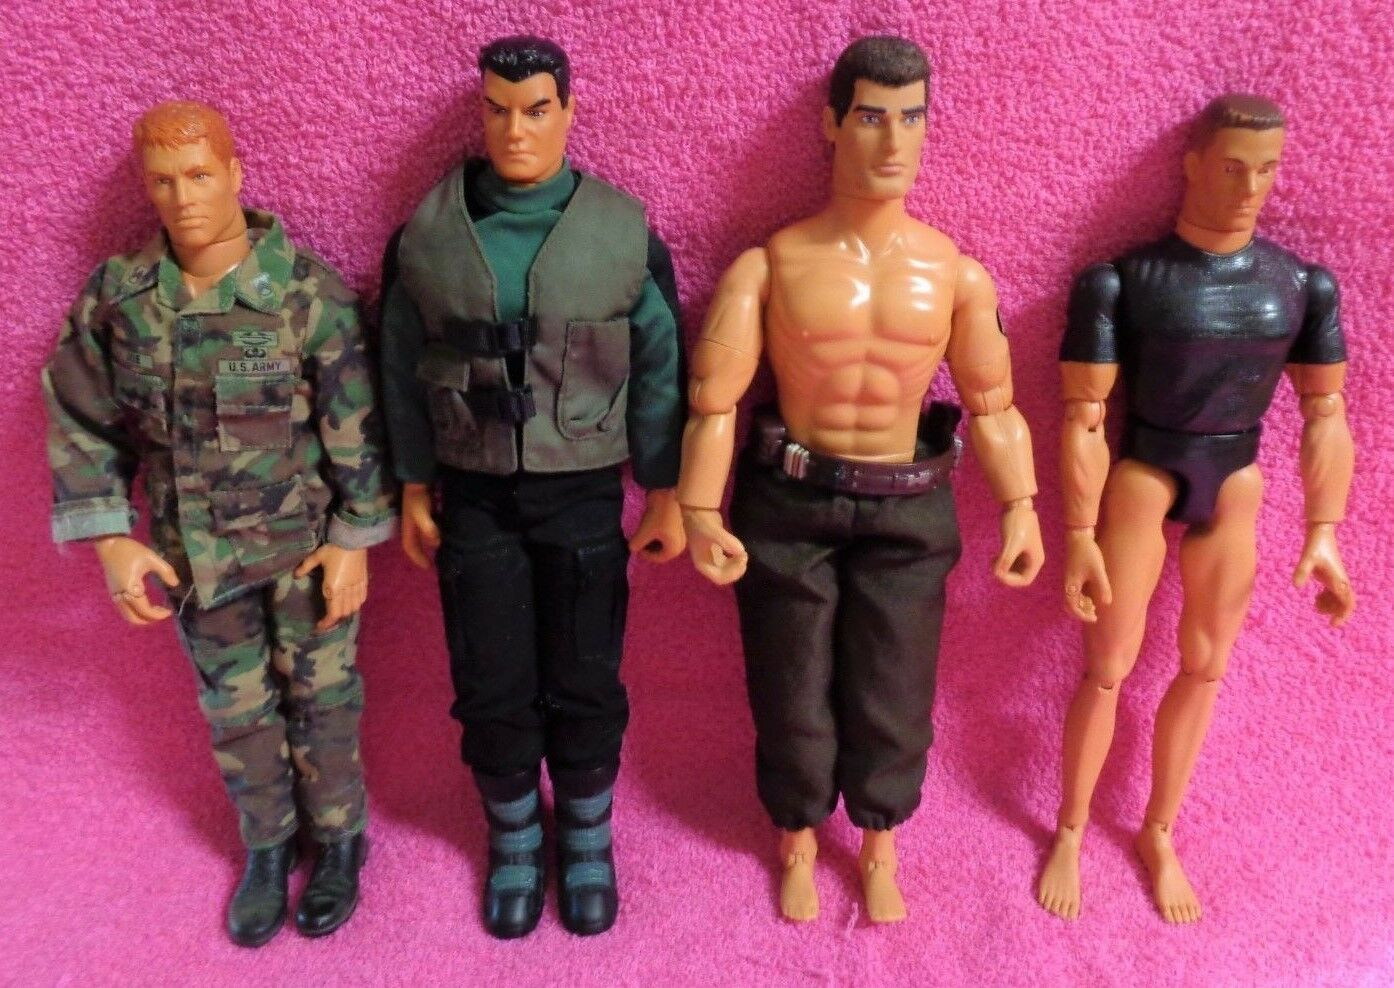 Hasbro GI Joe Lanard Toys Army Soldier 12